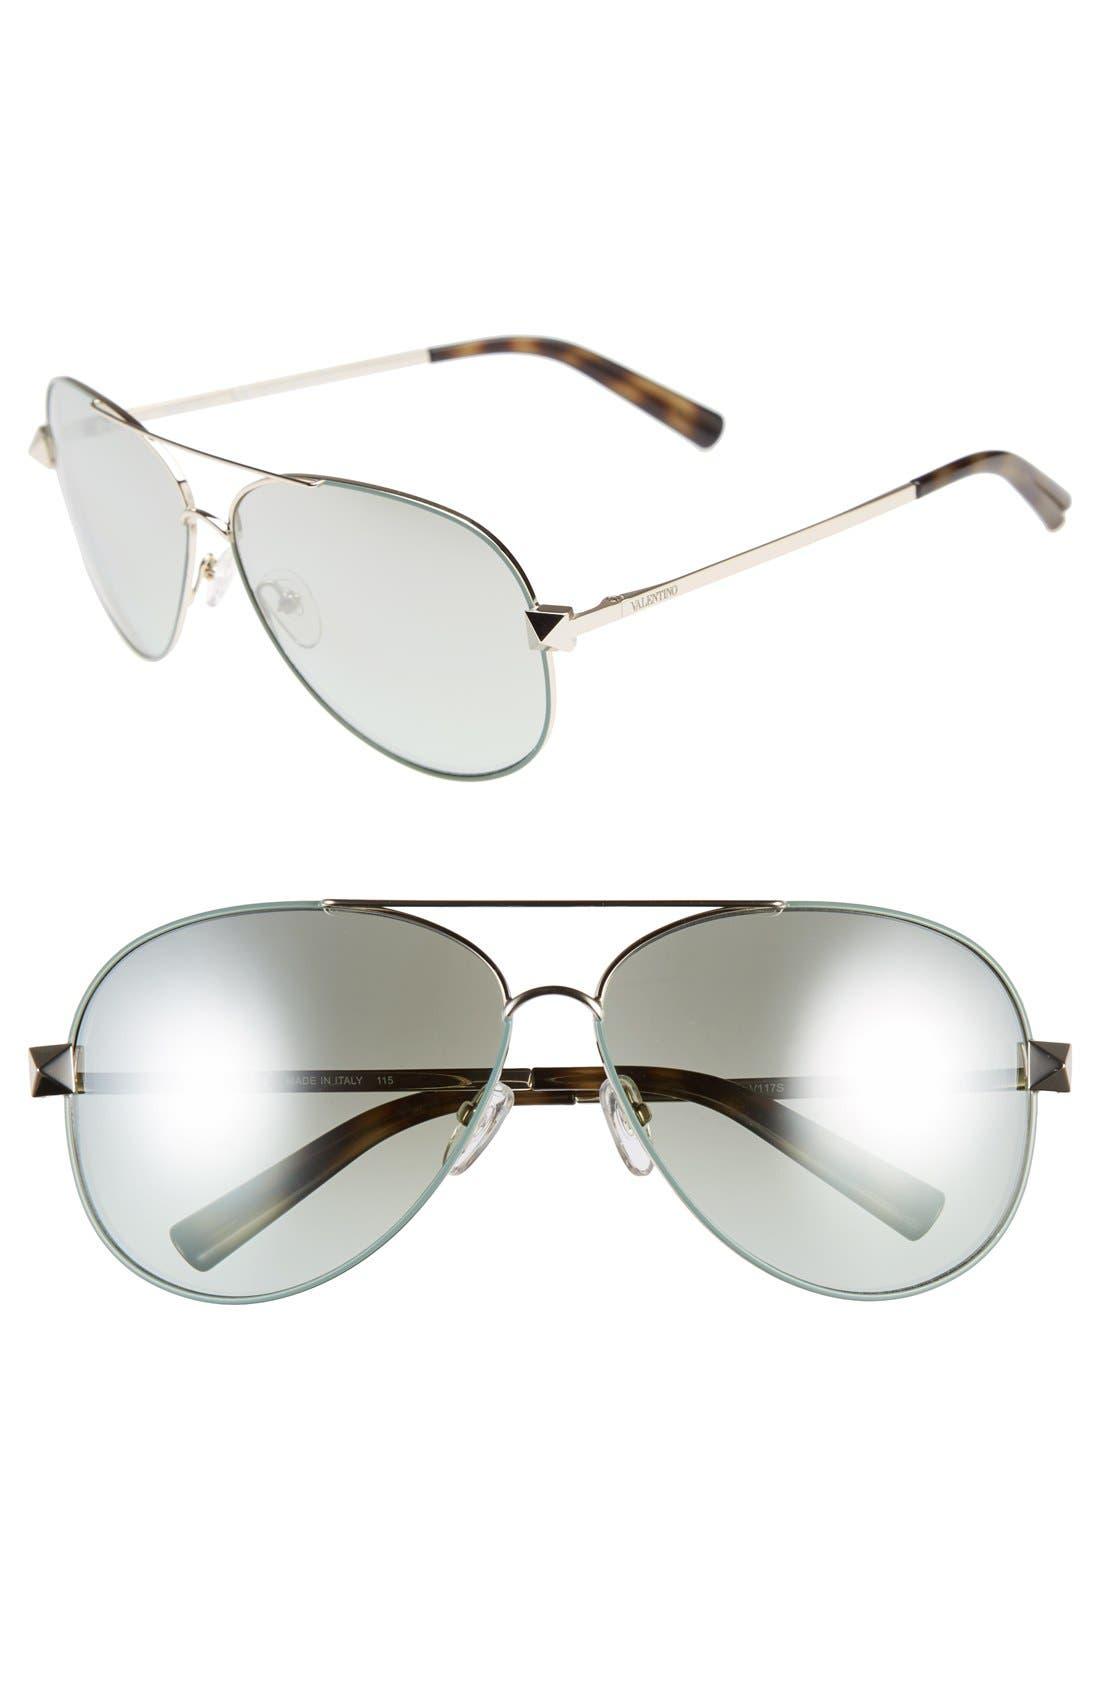 Alternate Image 1 Selected - Valentino 'Rockstud' 61mm Aviator Sunglasses